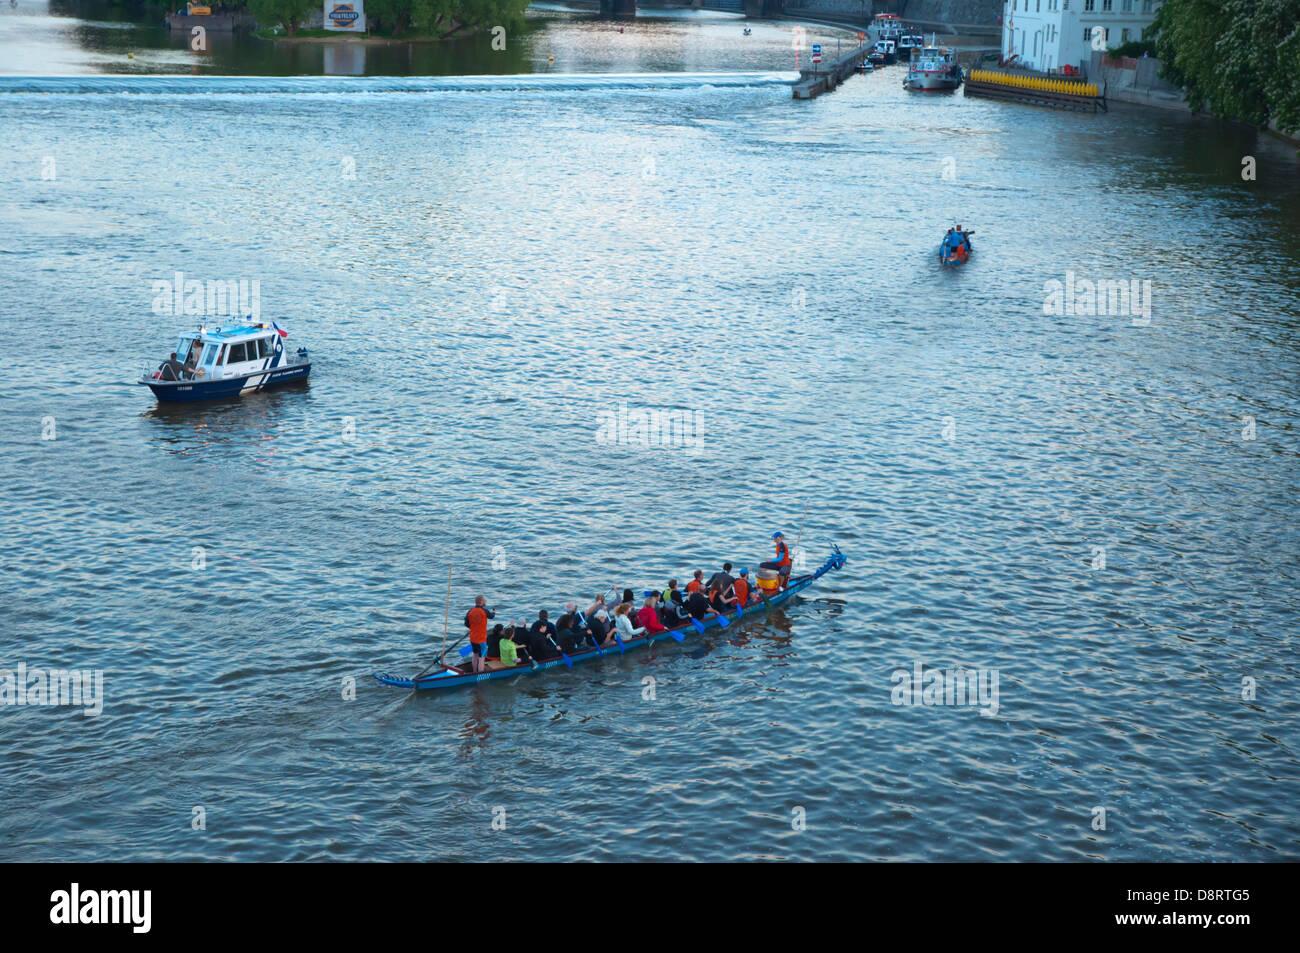 Regatta during Svatojanske Slavnosti Navalis religious festival in Vltava river central Prague city Czech Republic - Stock Image